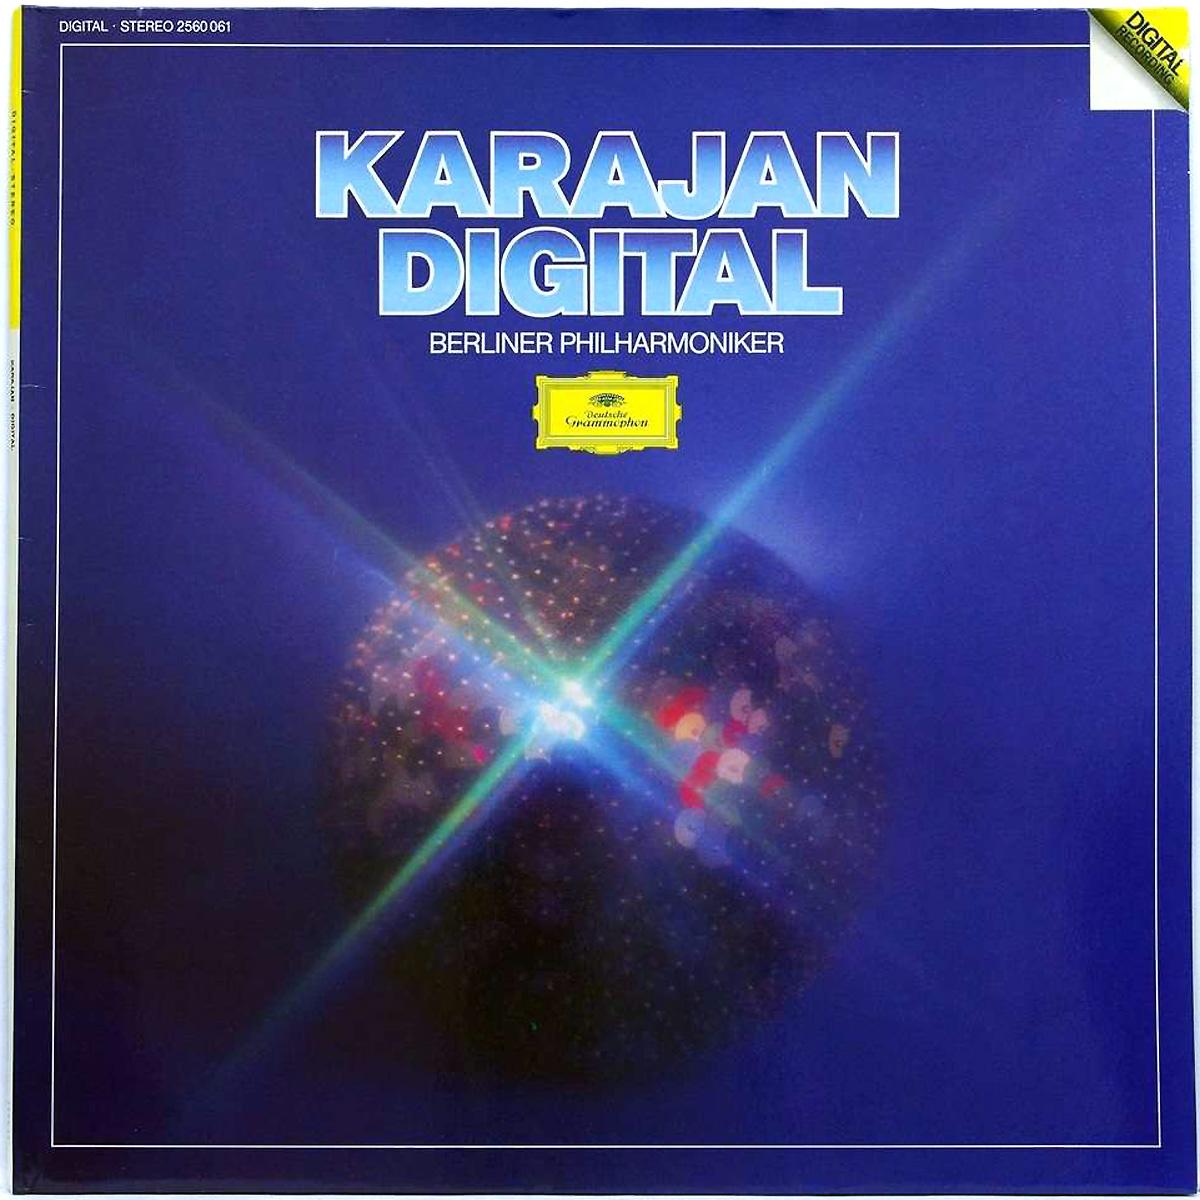 DGG 2560061 Holst Mozart Offenbach Prokofiev Strauss Karajan DGG Digital Aufnahme